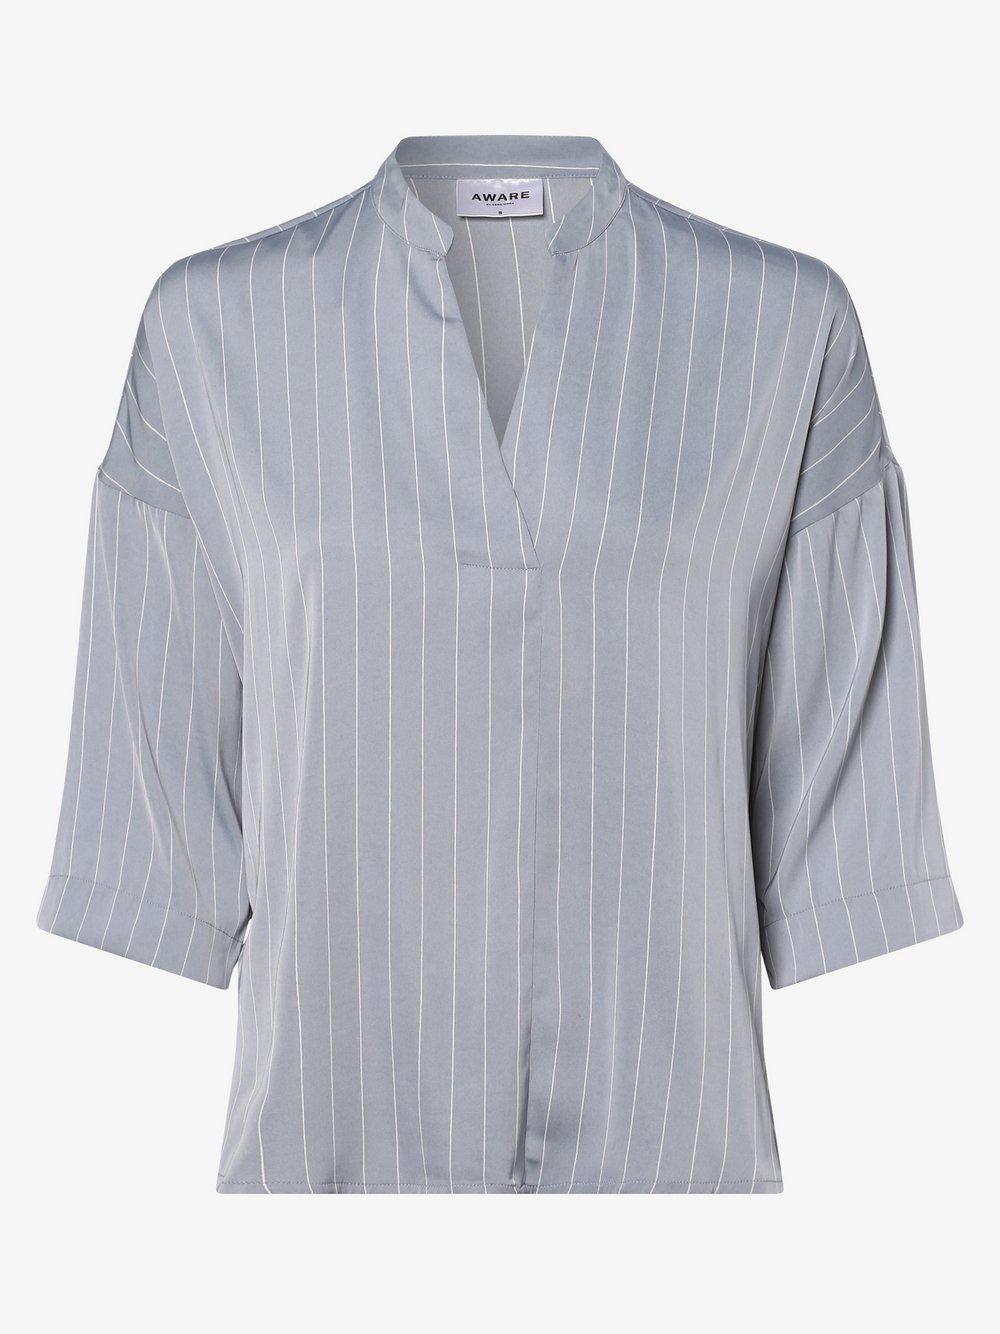 Vero Moda – Bluzka damska – Vmkarolina, niebieski Van Graaf 469118-0001